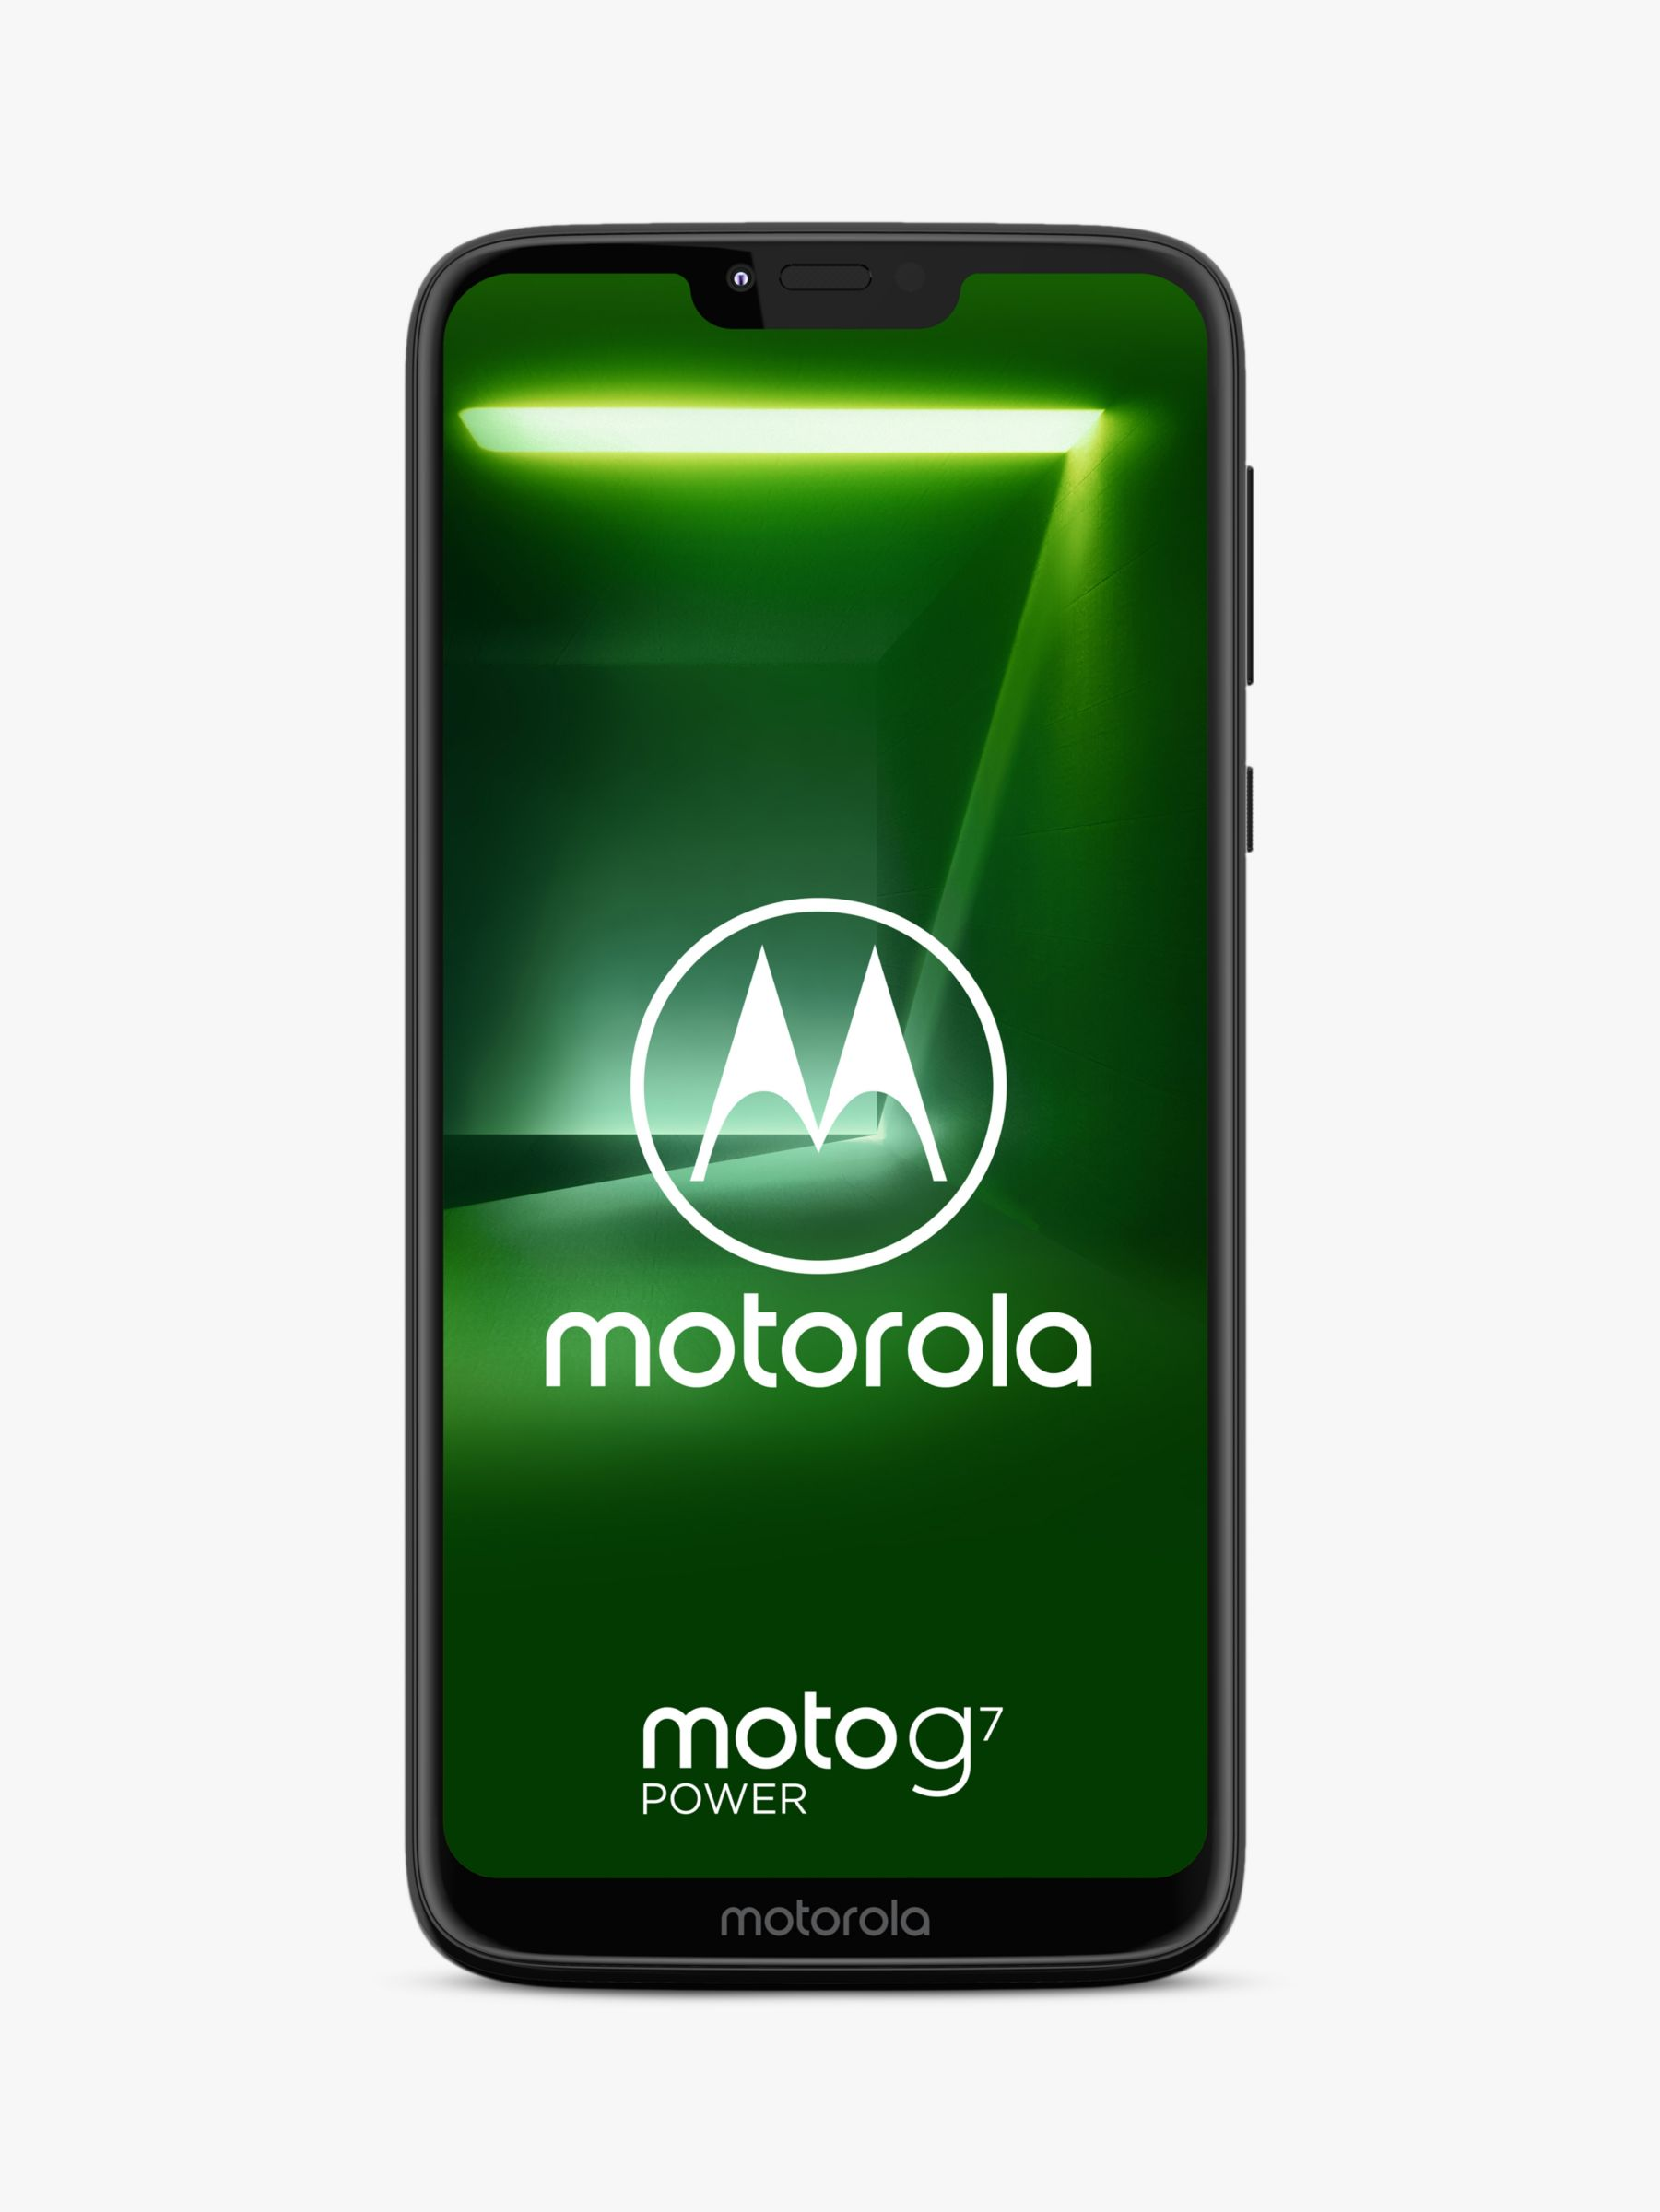 Motorola Motorola g7 Power SIM Free Smartphone, Android, 6.2, 4G LTE, SIM Free, 64GB